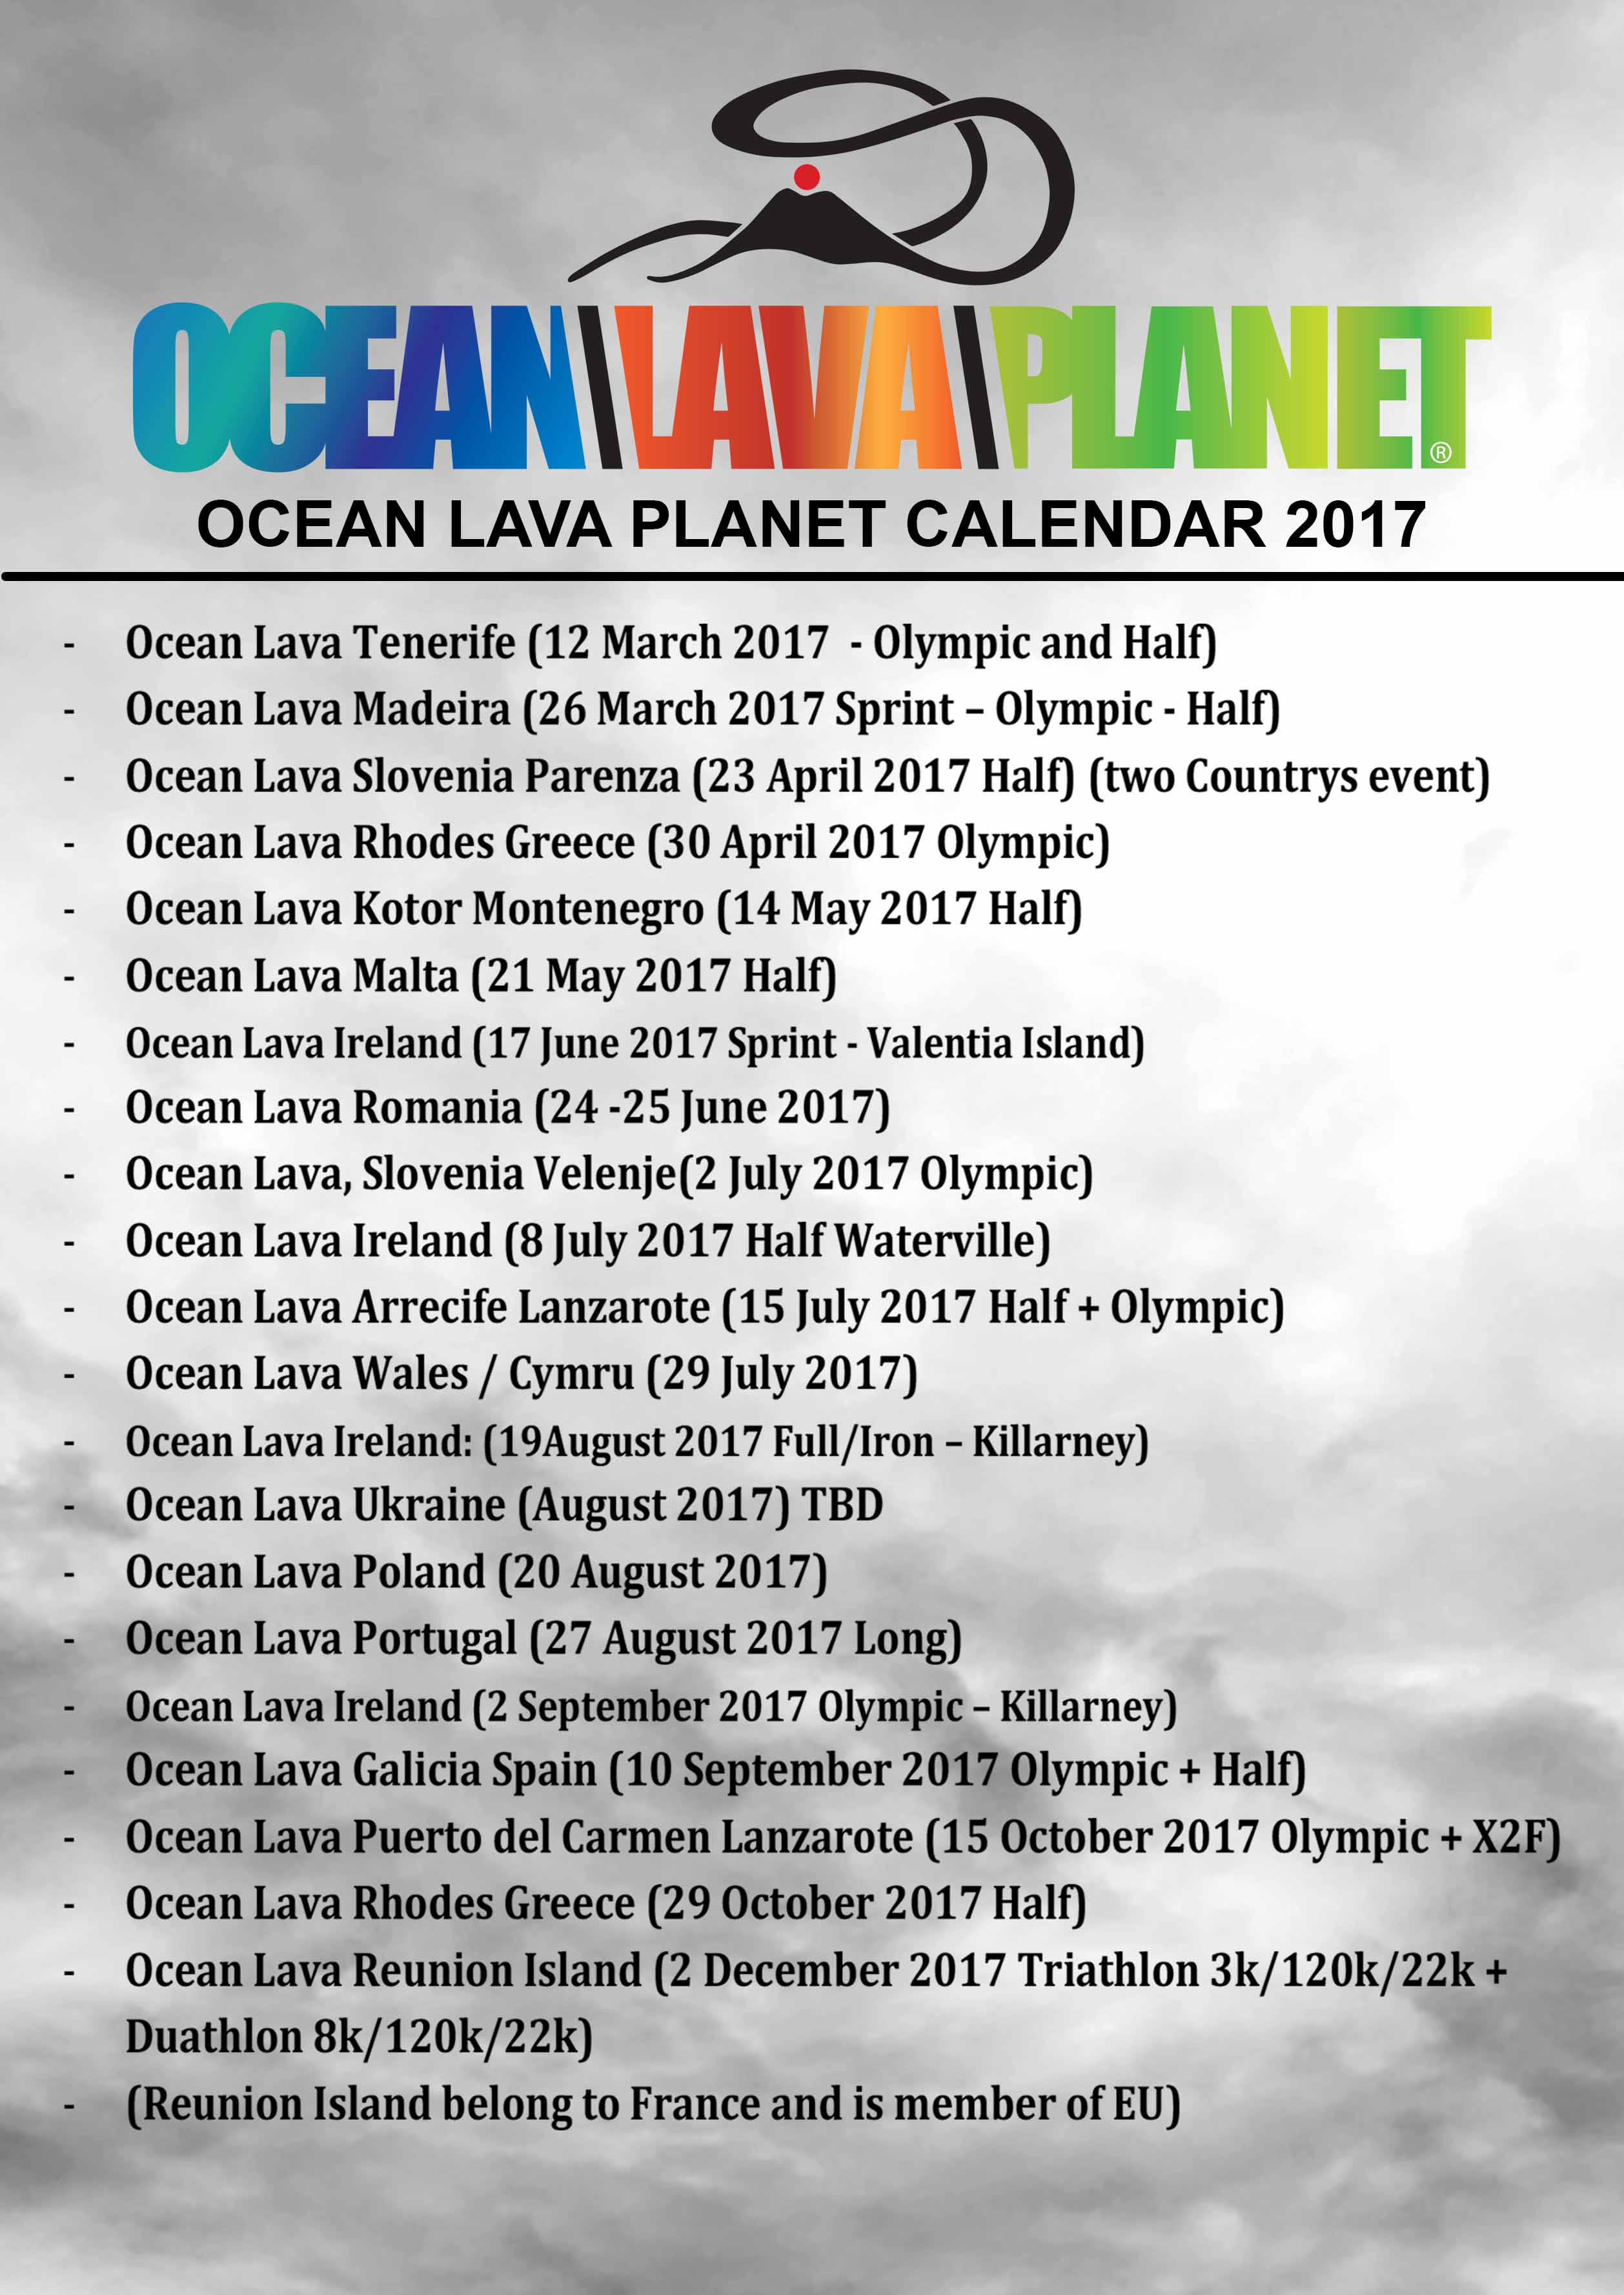 Ocean Lava Planet Calendar